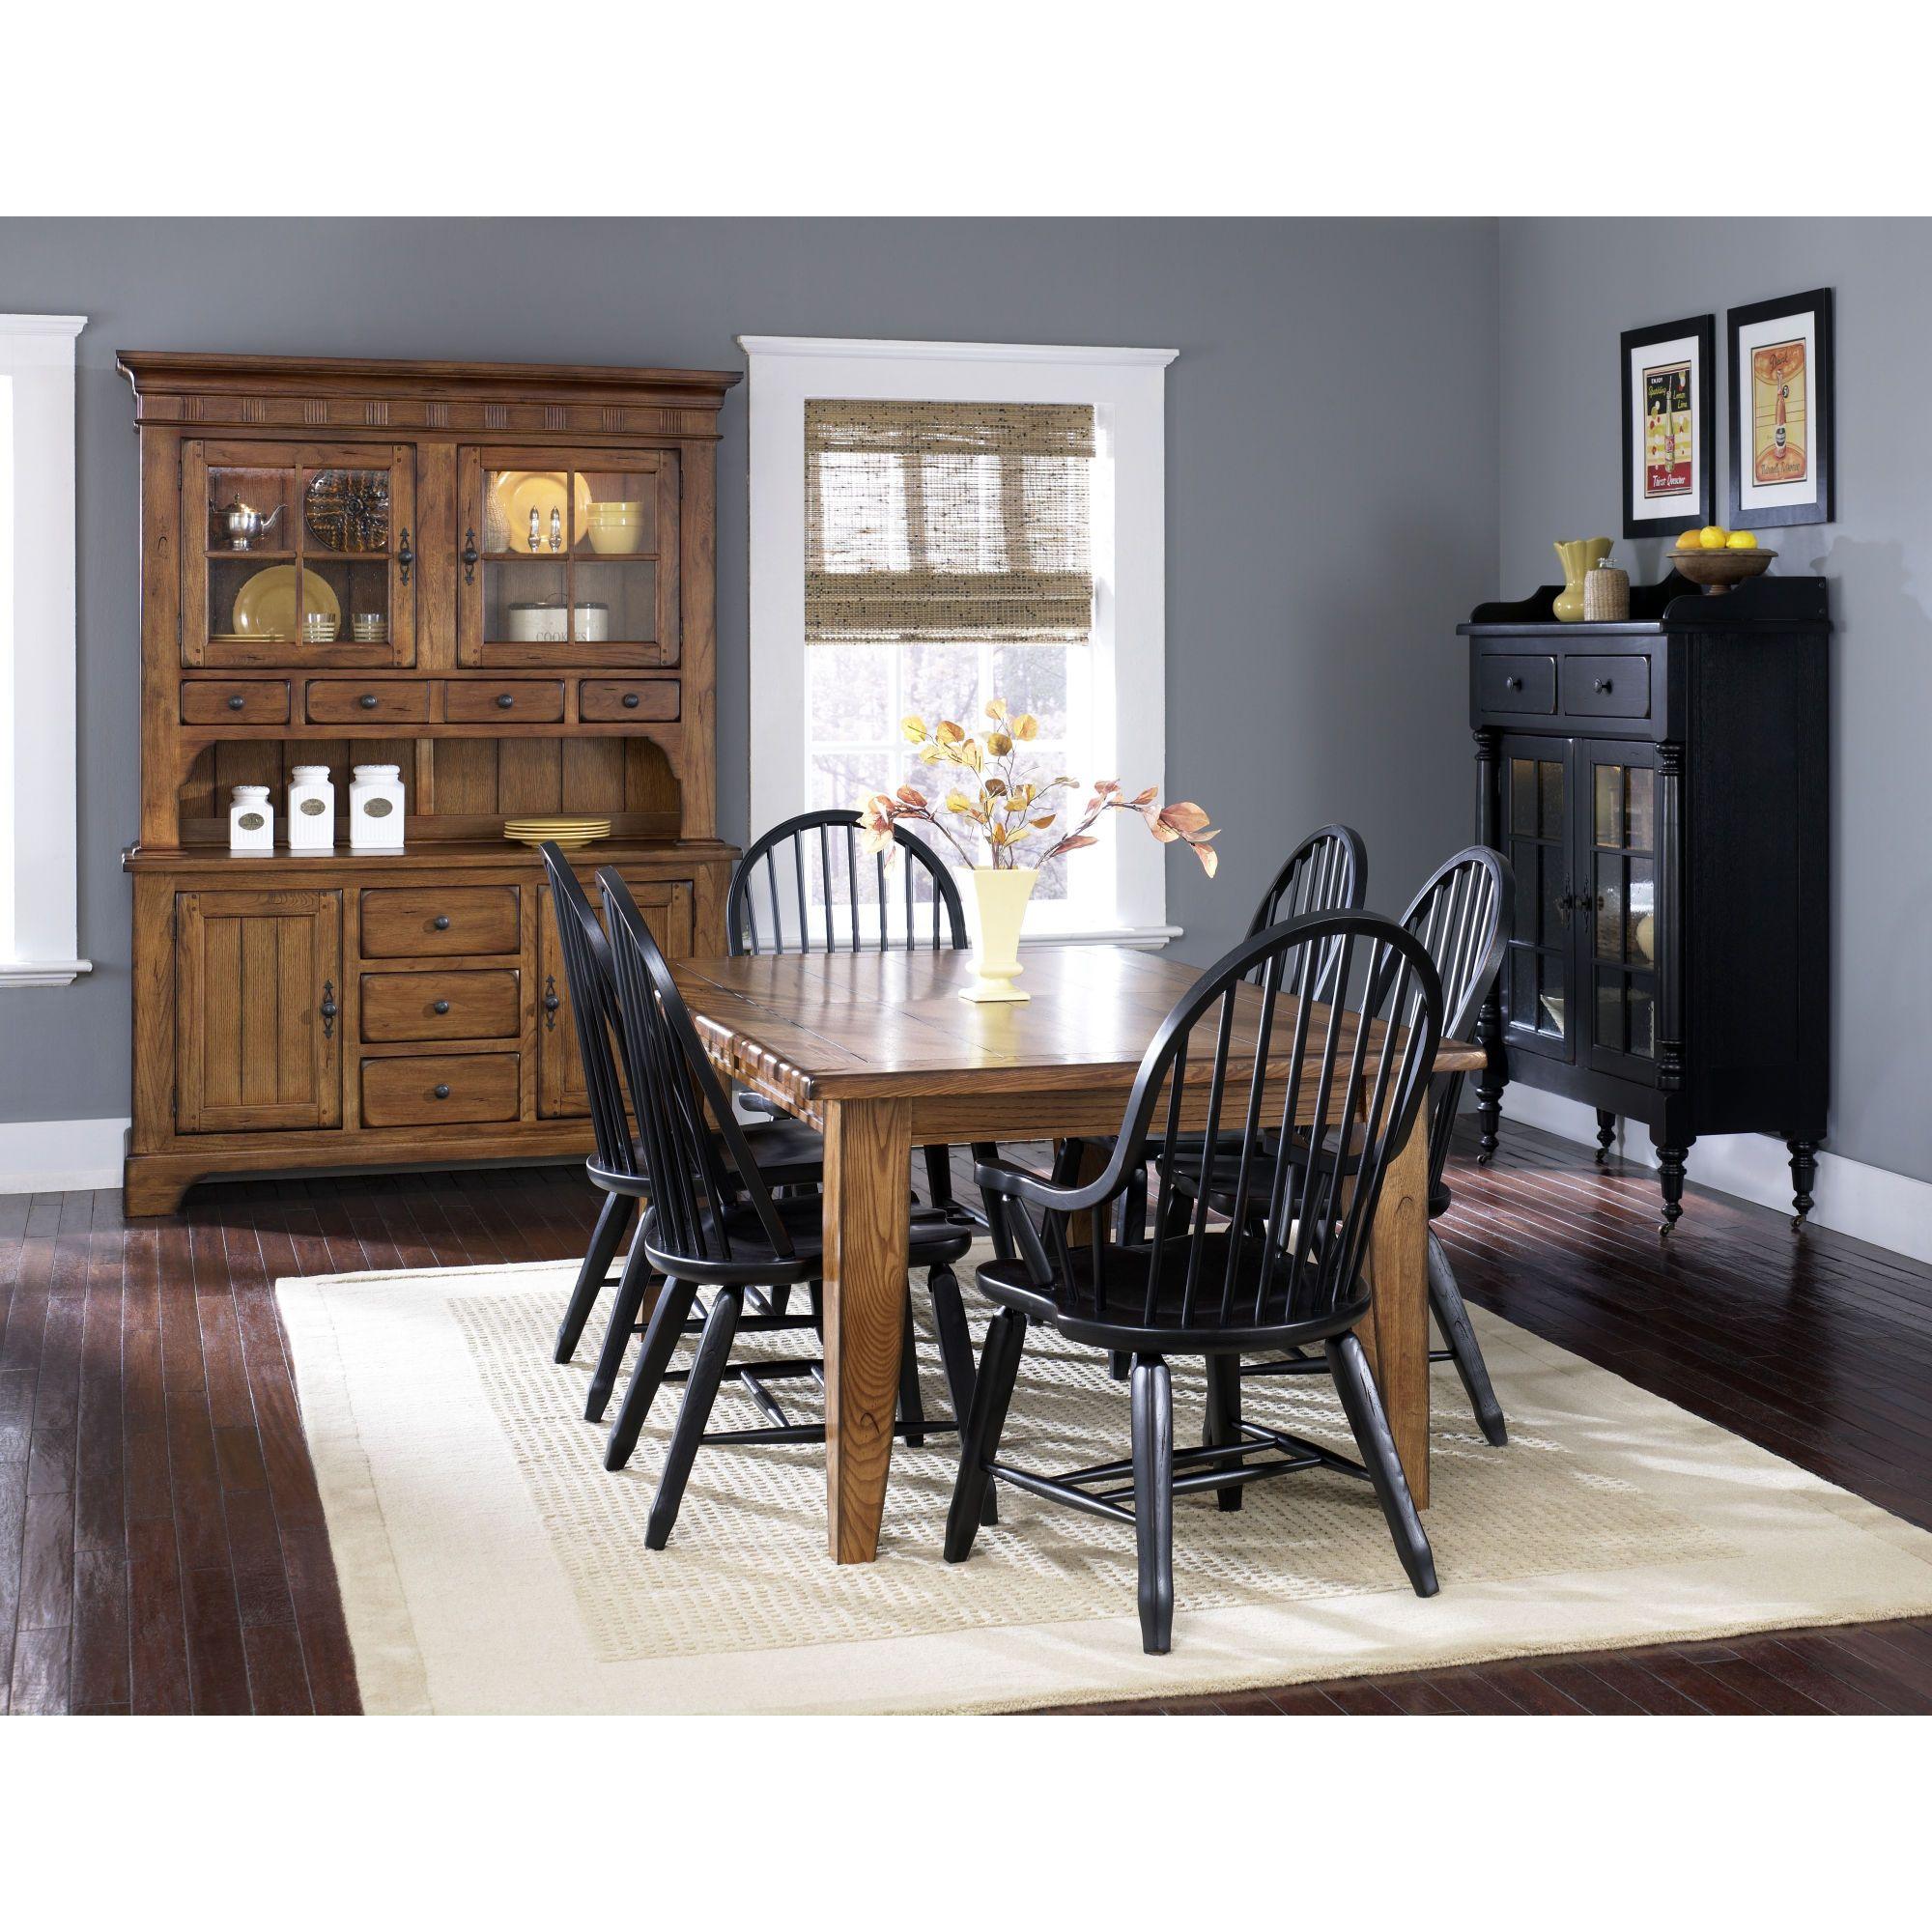 Liberty Furniture Treasures Formal 7 Piece Dining Set Dining Room Design Black Dining Room Black Dining Room Sets